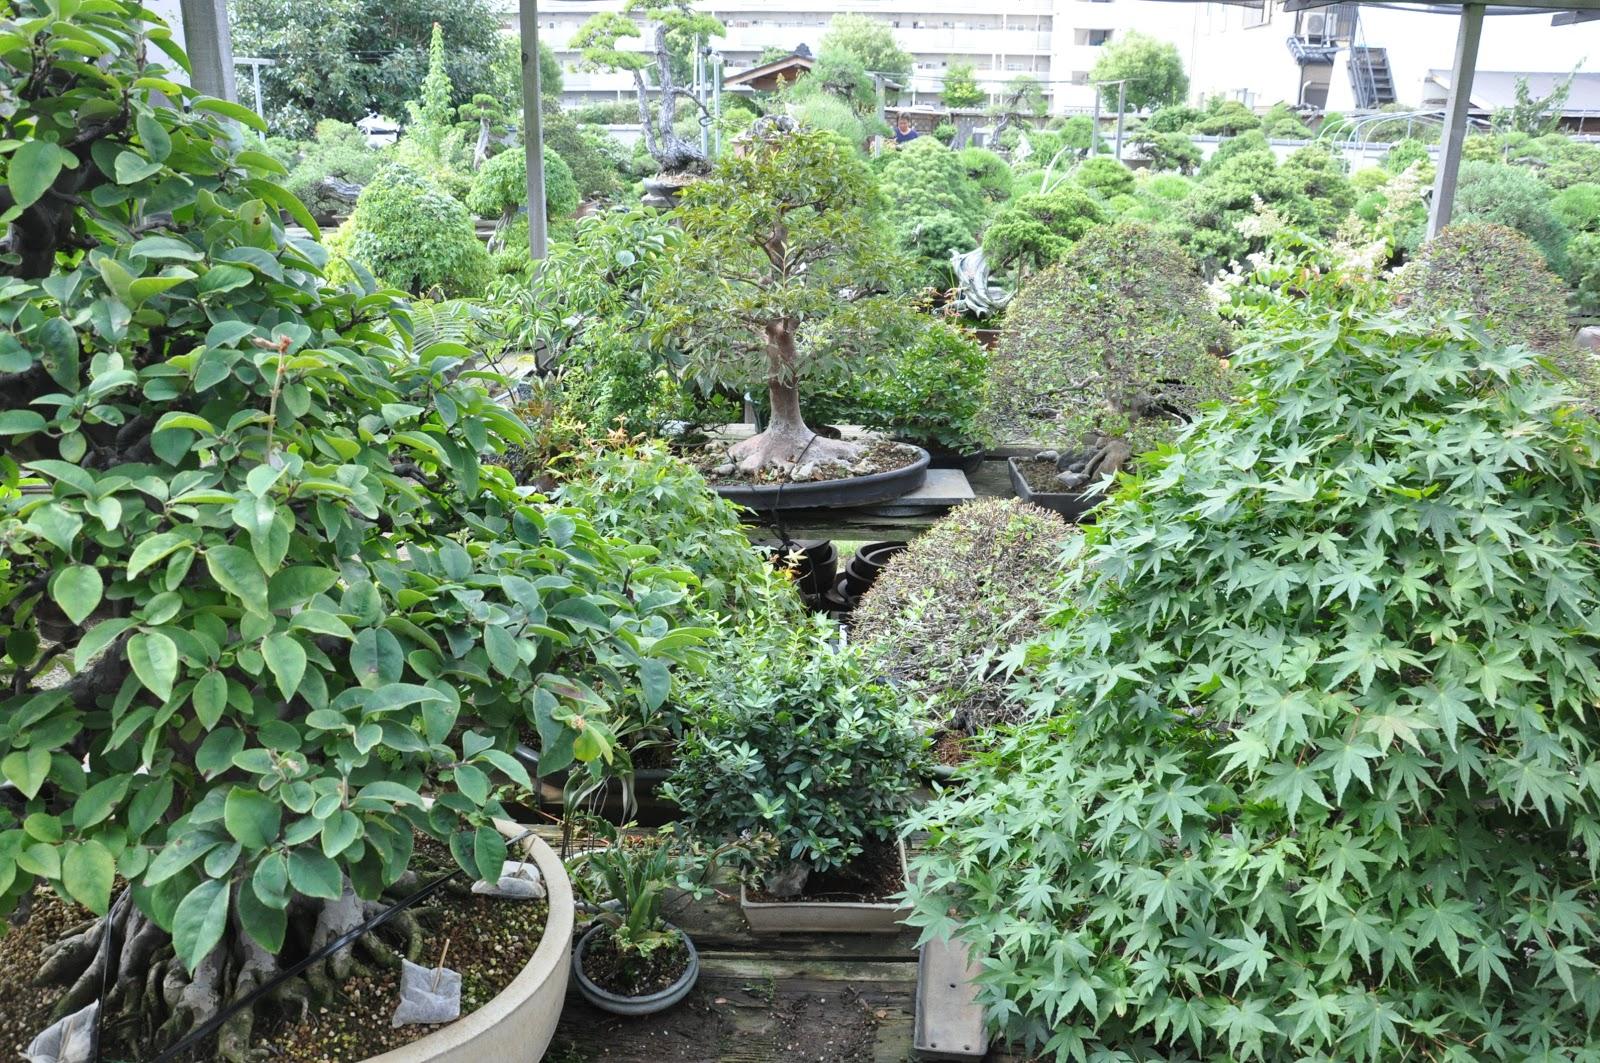 All In One Bonsai And Ceramics Bonsai In Japan